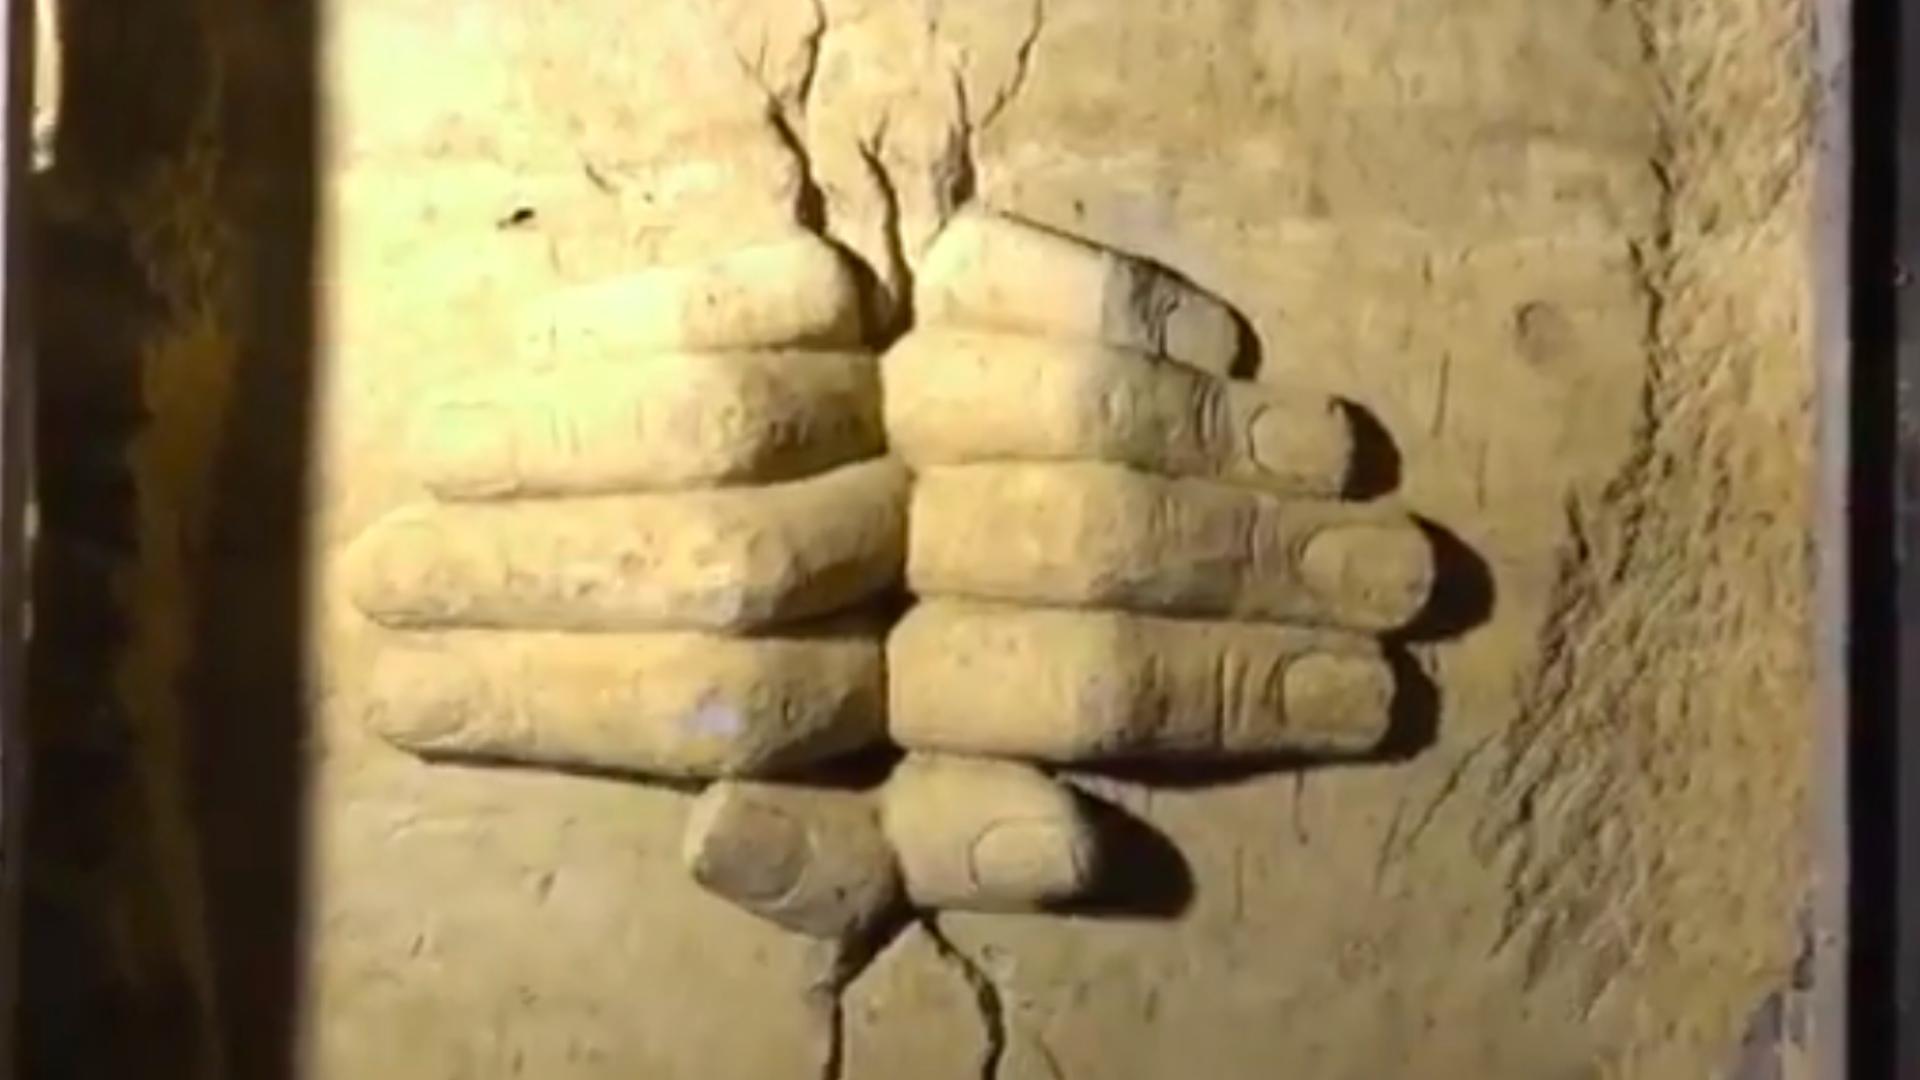 Tunnel sculpture in former militant passageway in Syria